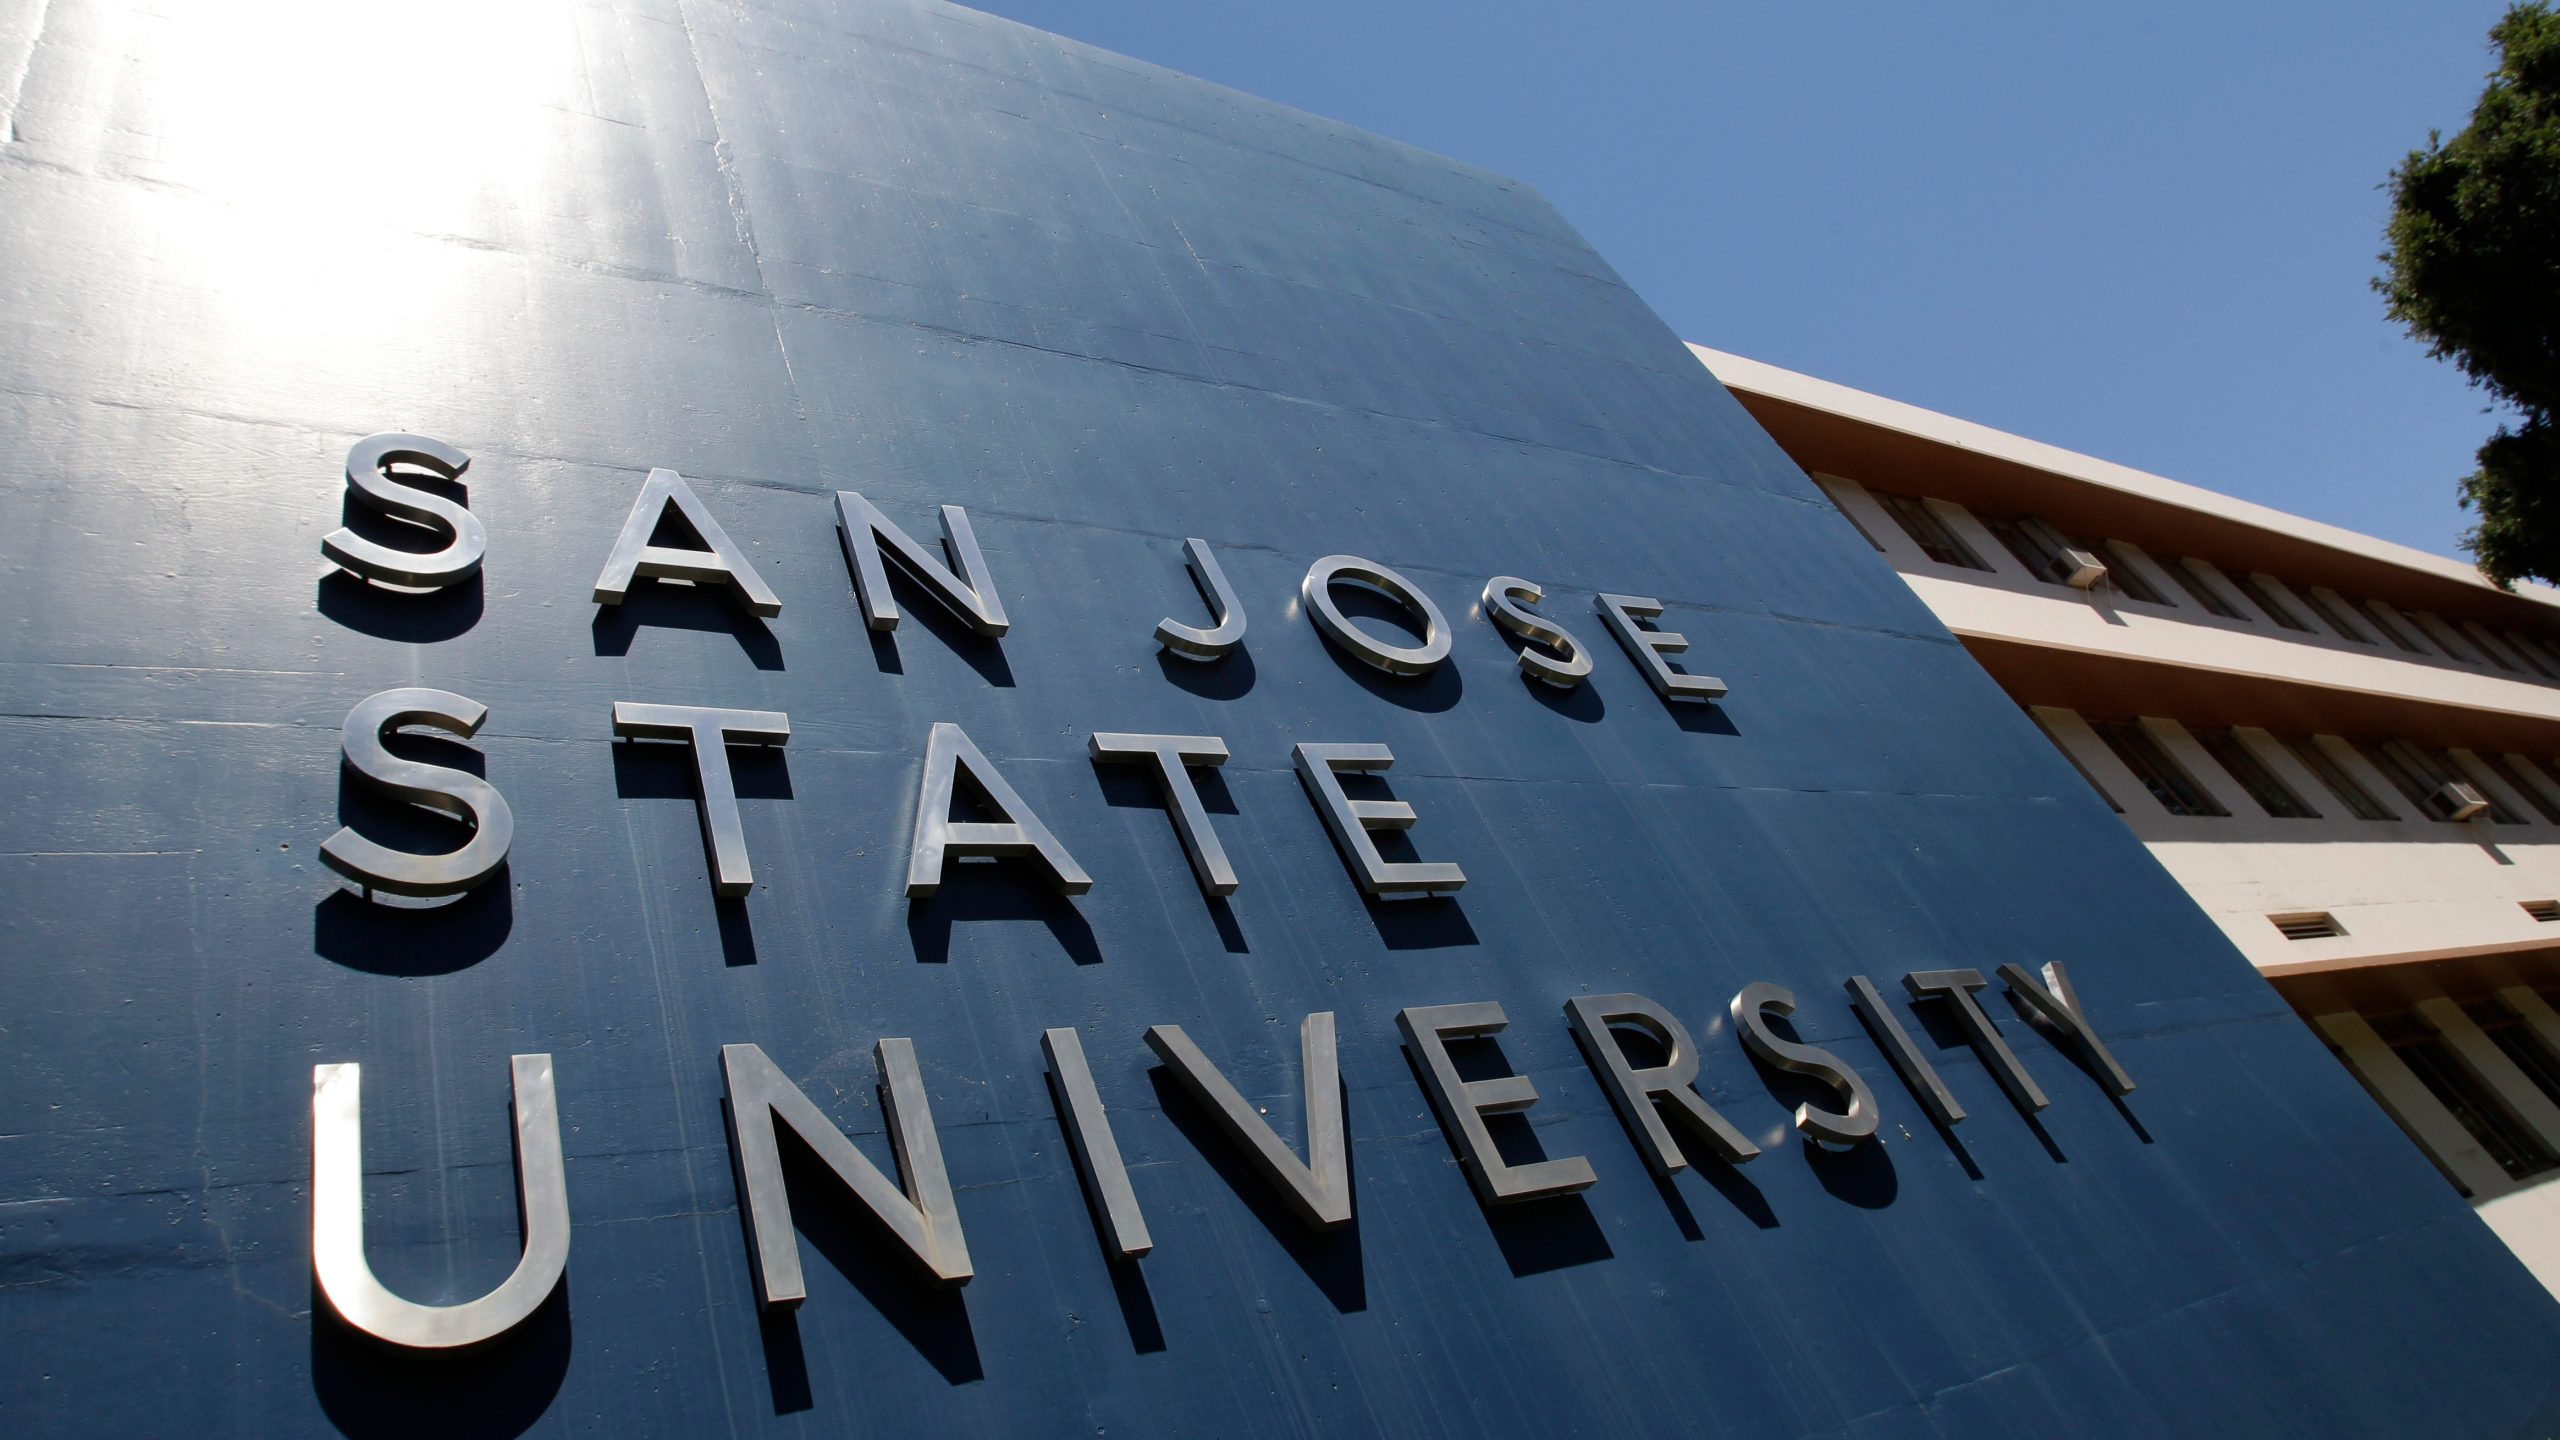 An exterior view of San Jose State University is shown in a 2011 file photo. (Paul Sakuma/Associated Press)